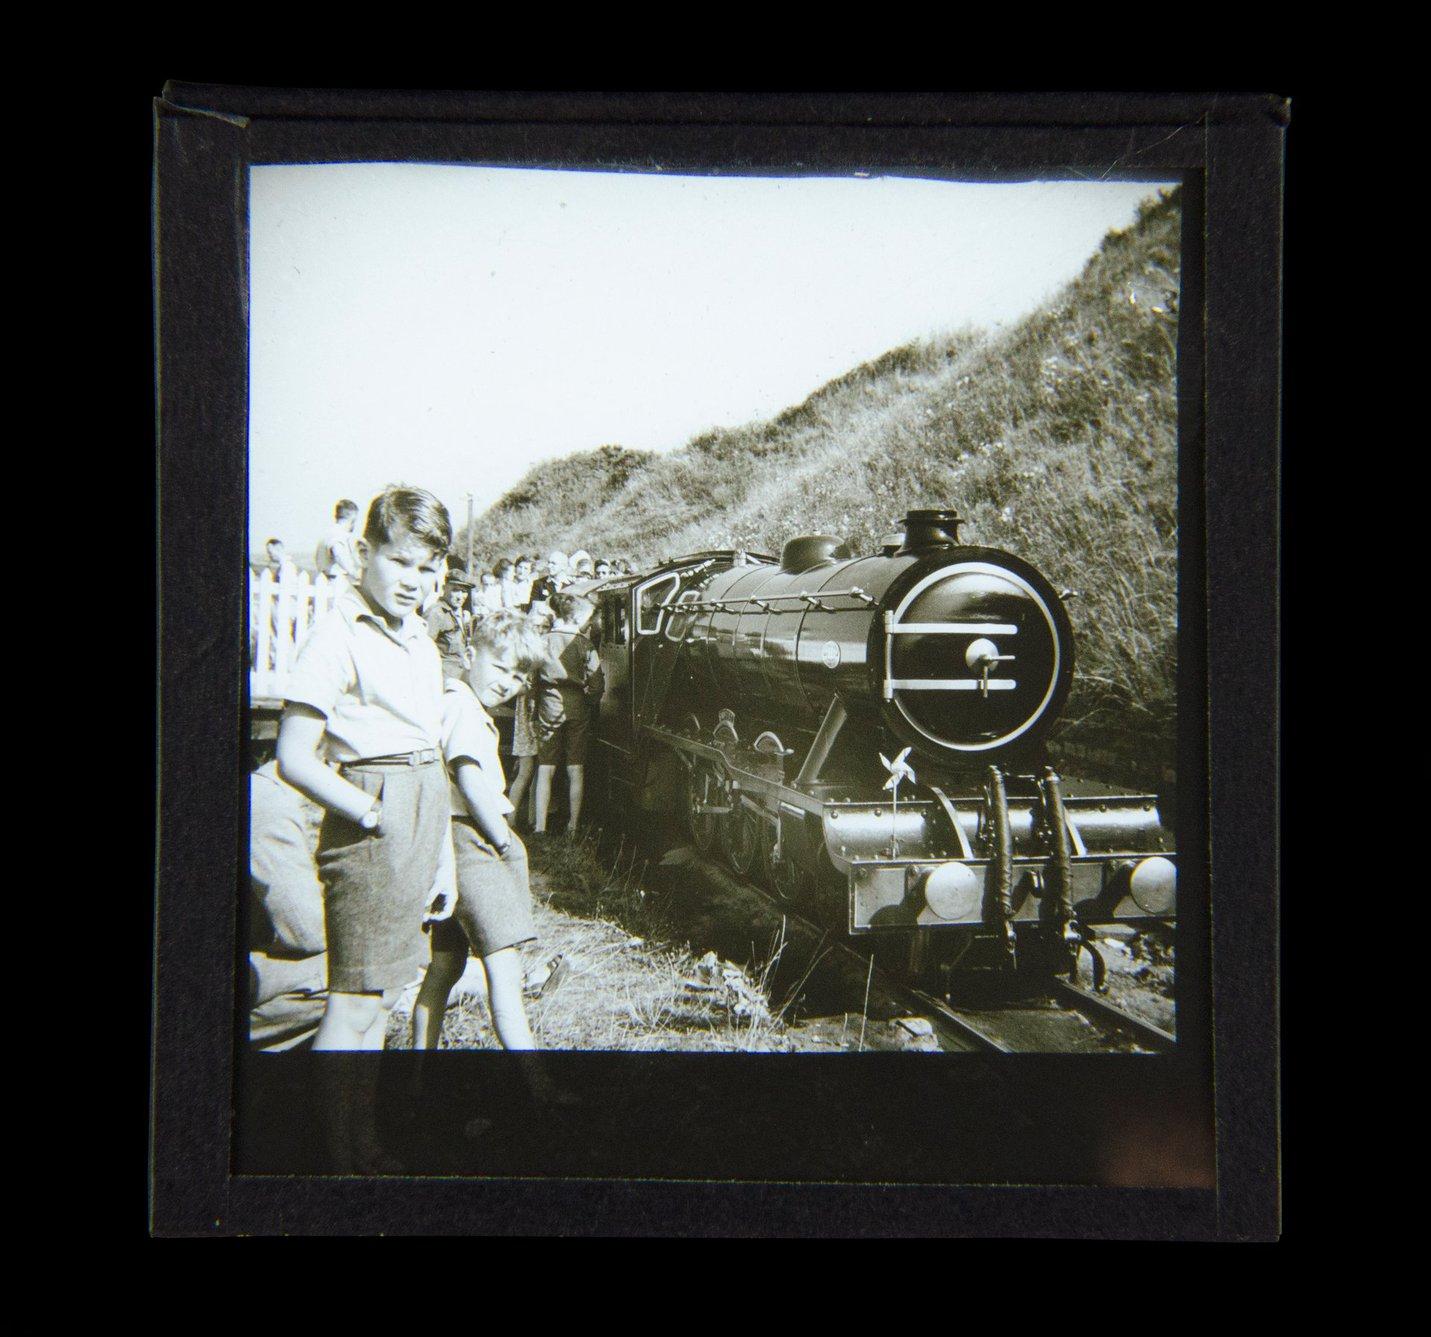 Magic Lantern Slide - Steam engine c1930 photo North Bay railway Scarborough.jpg